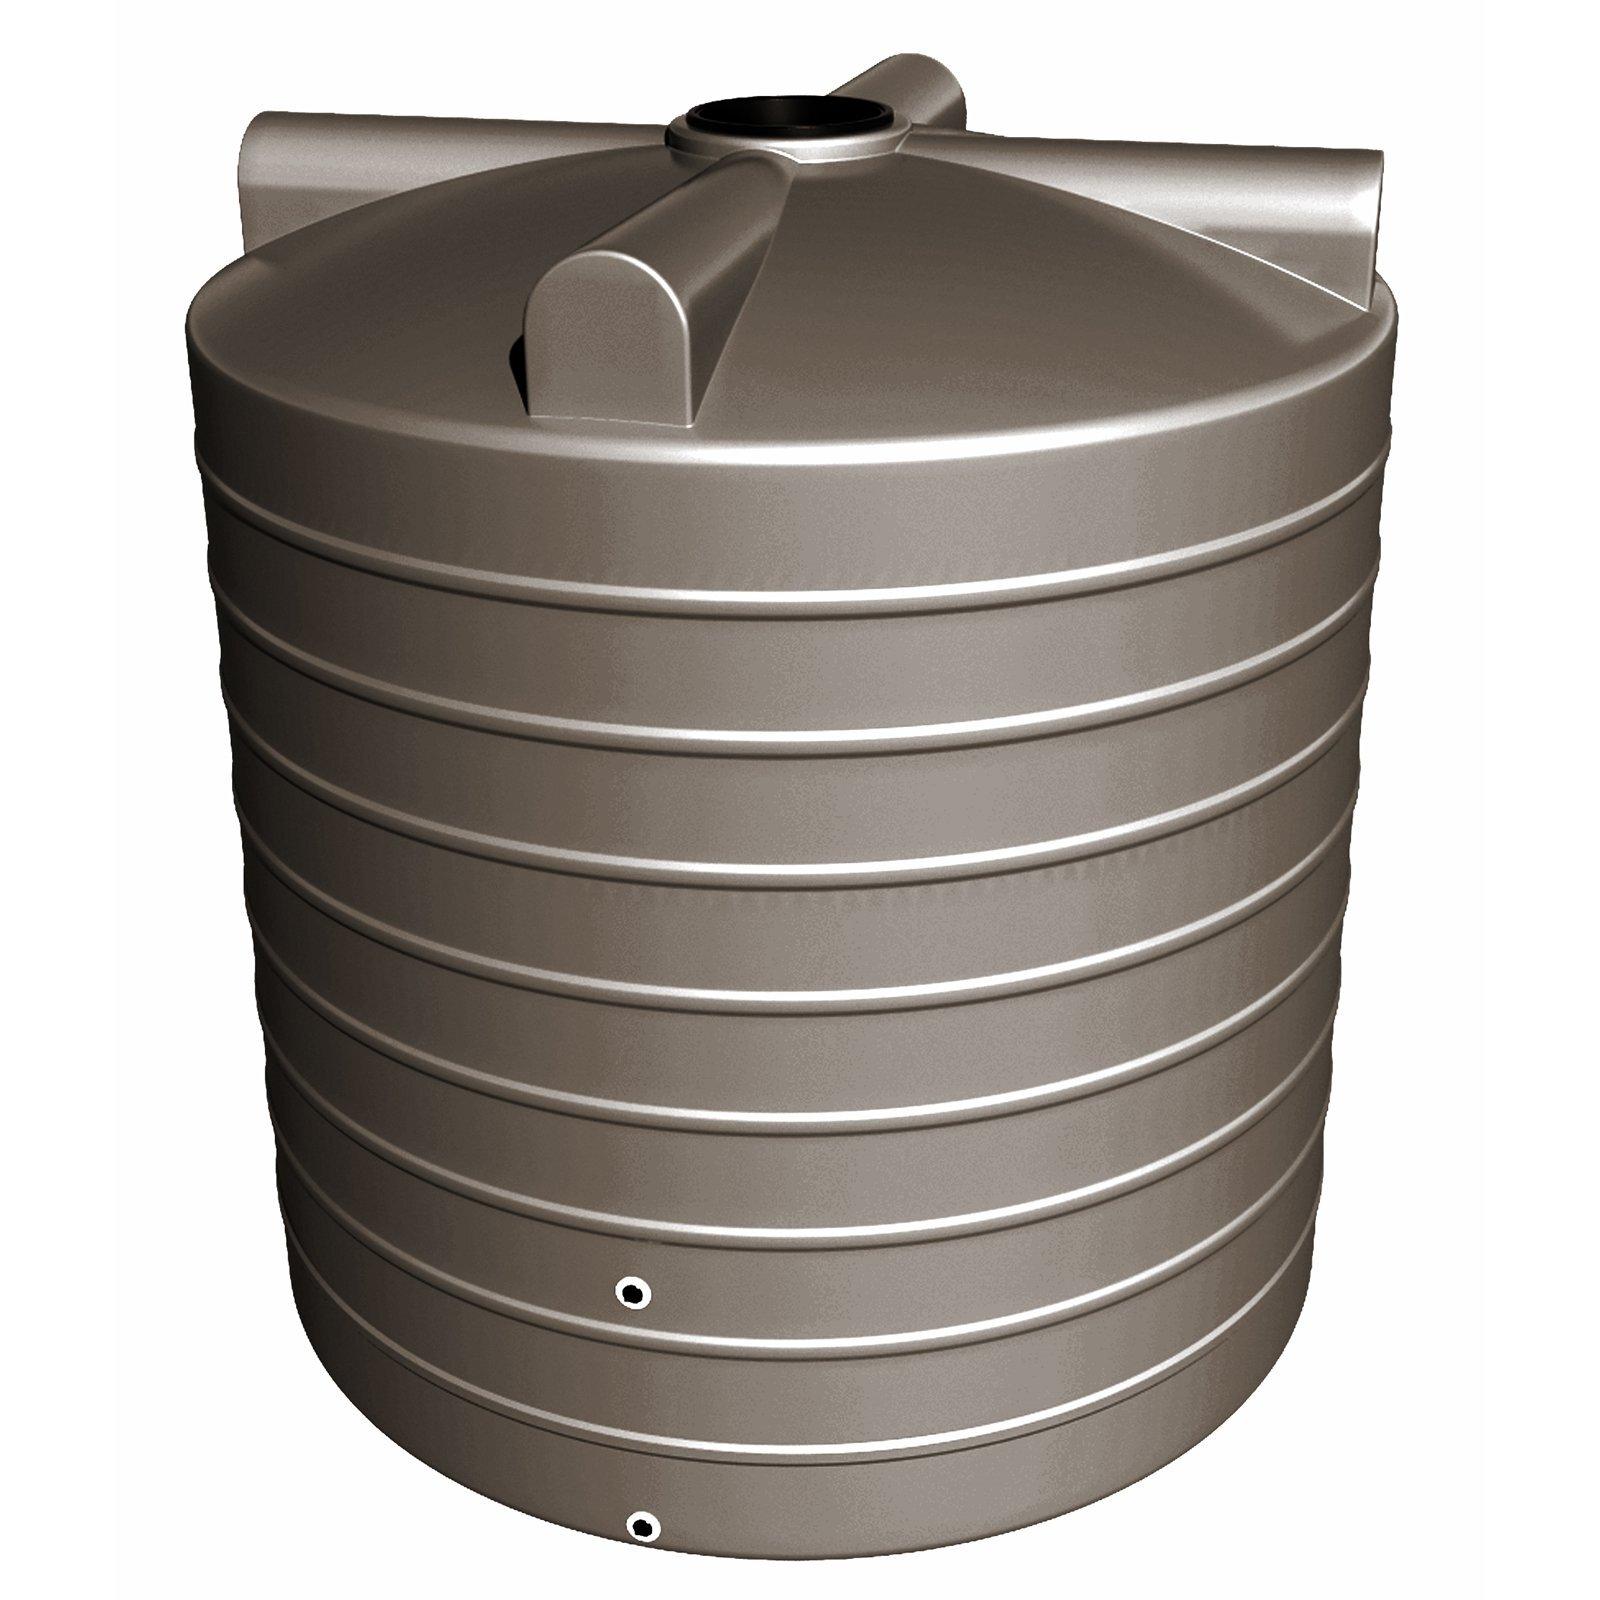 NextGenRoto 10400L Polyethylene Round Water Tank - Clay Brown